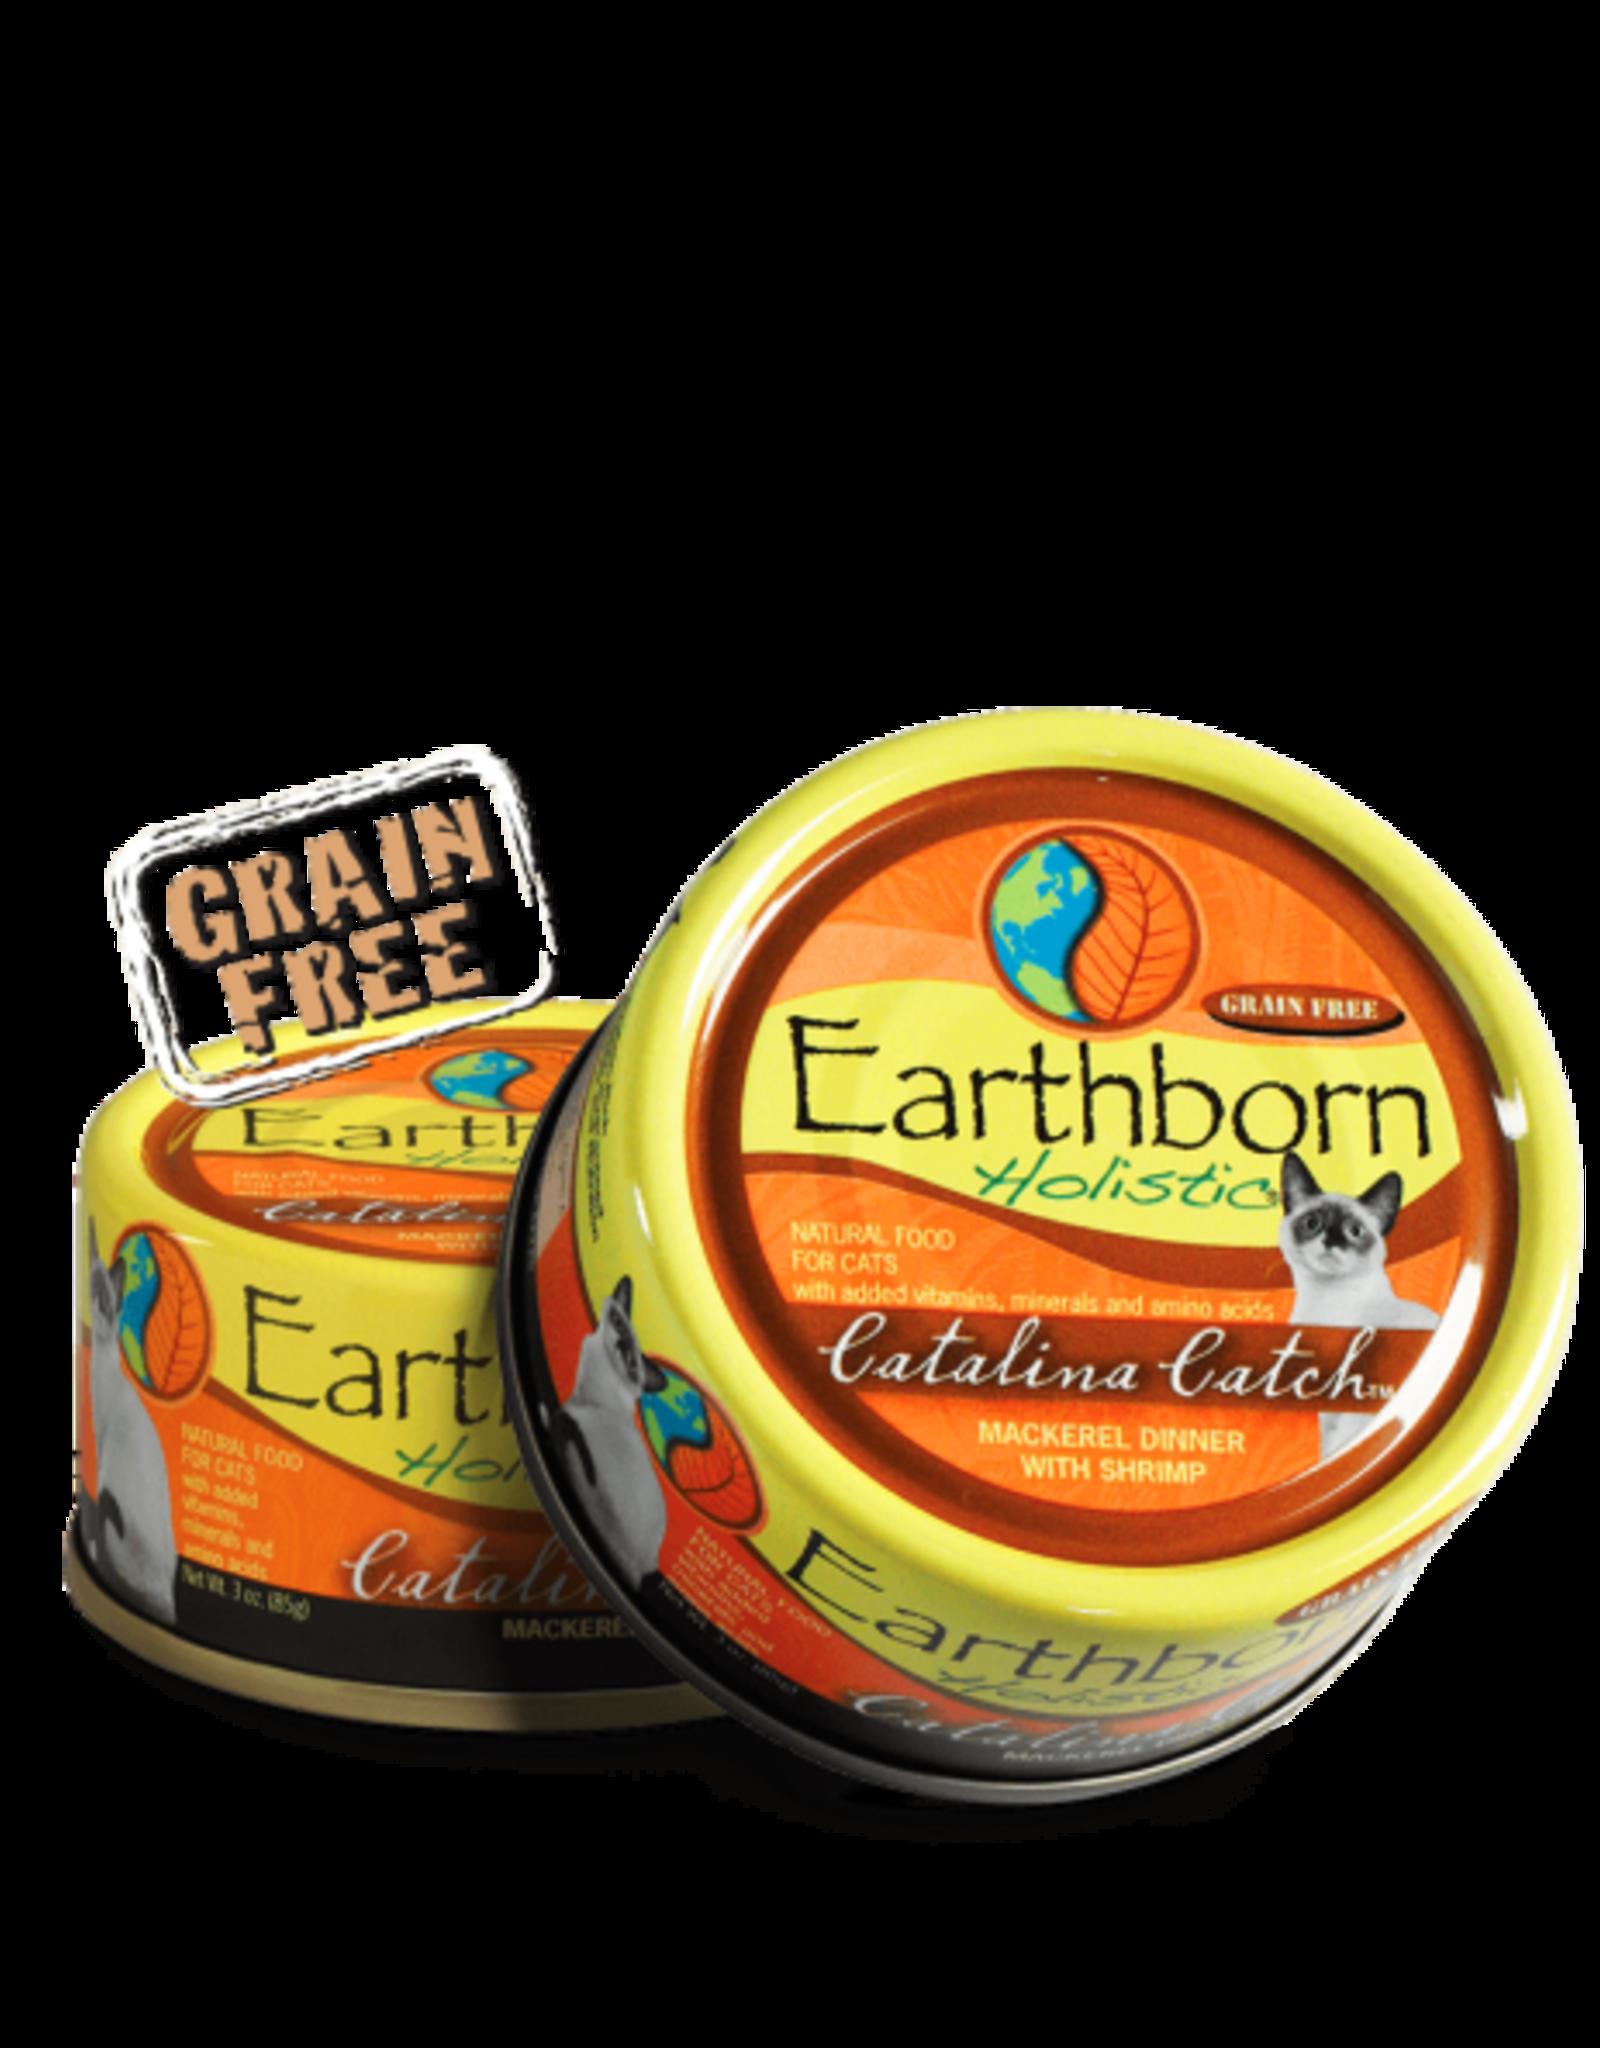 Earthborn Holistic Cat Catalina Catch Shredded - Grain-Free 5.5oz